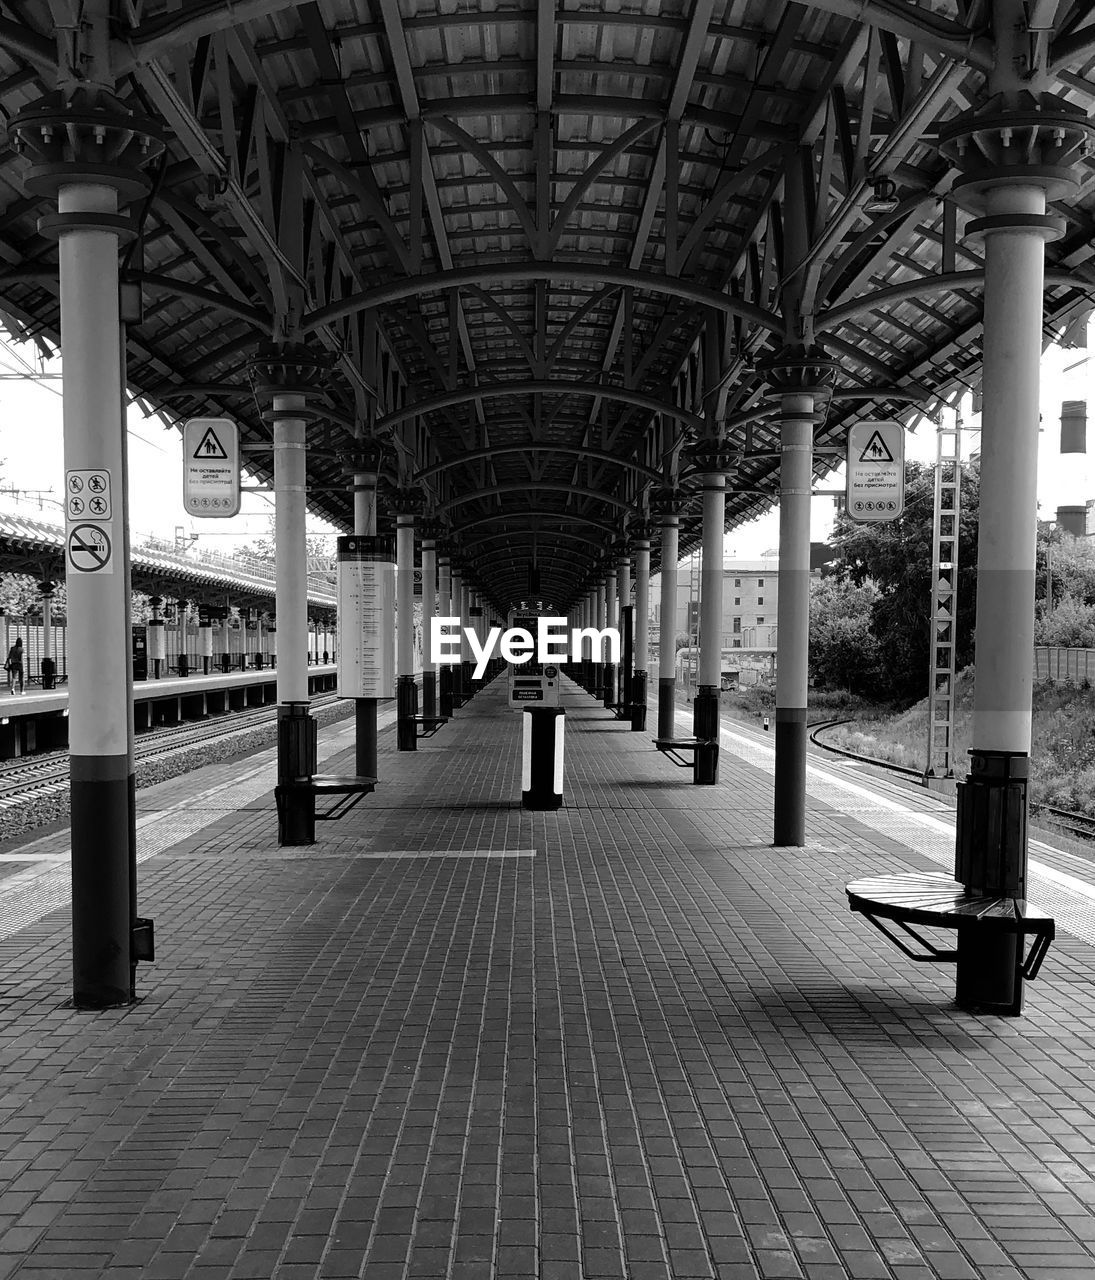 EMPTY RAILROAD STATION PLATFORM IN CITY